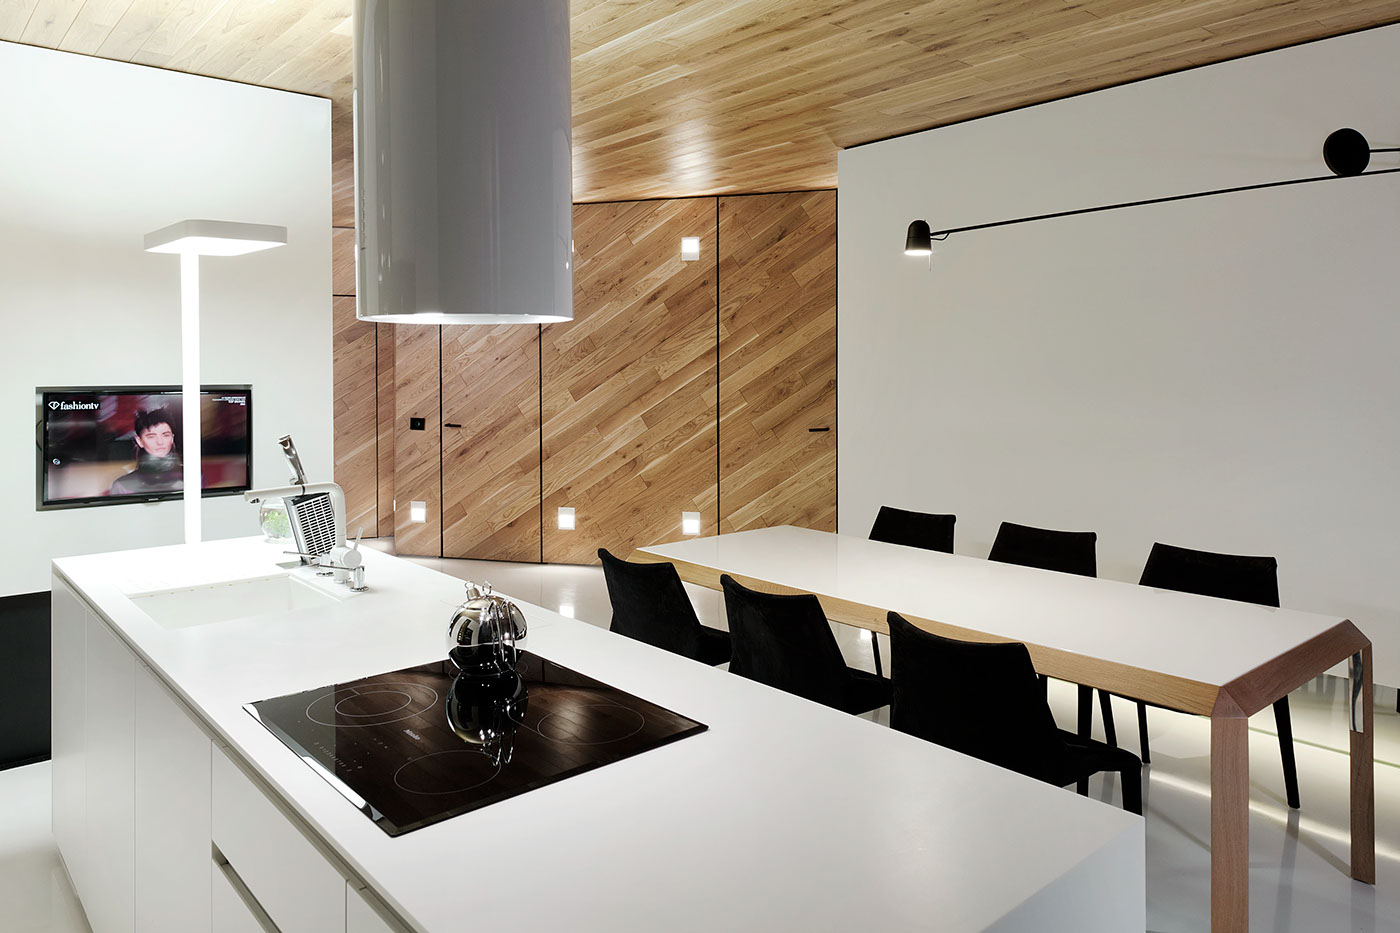 studio mode5 Loft Apartment By Studio Mode